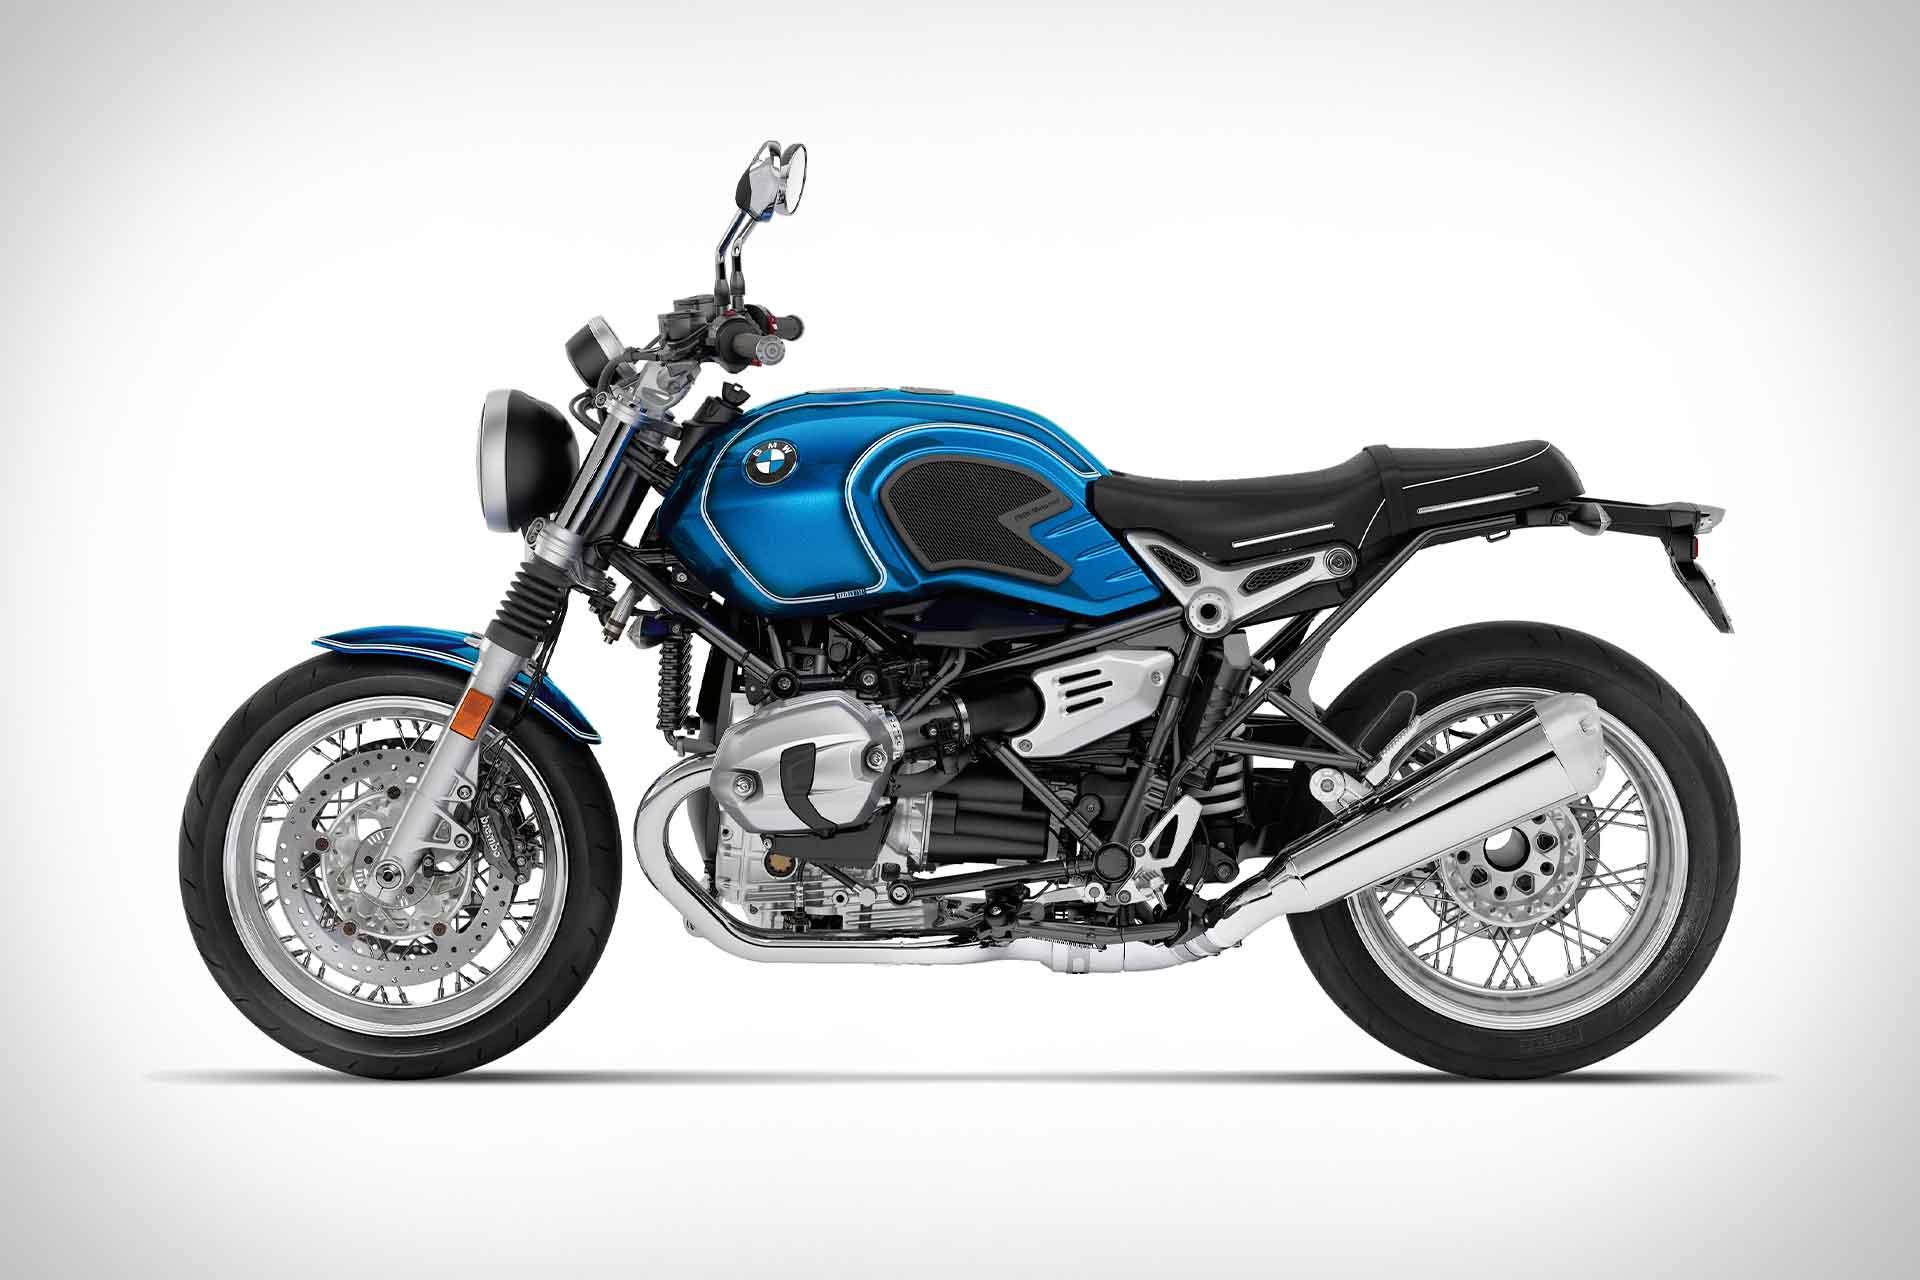 2019 Bmw R Ninet 5 Motorcycle Uncrate